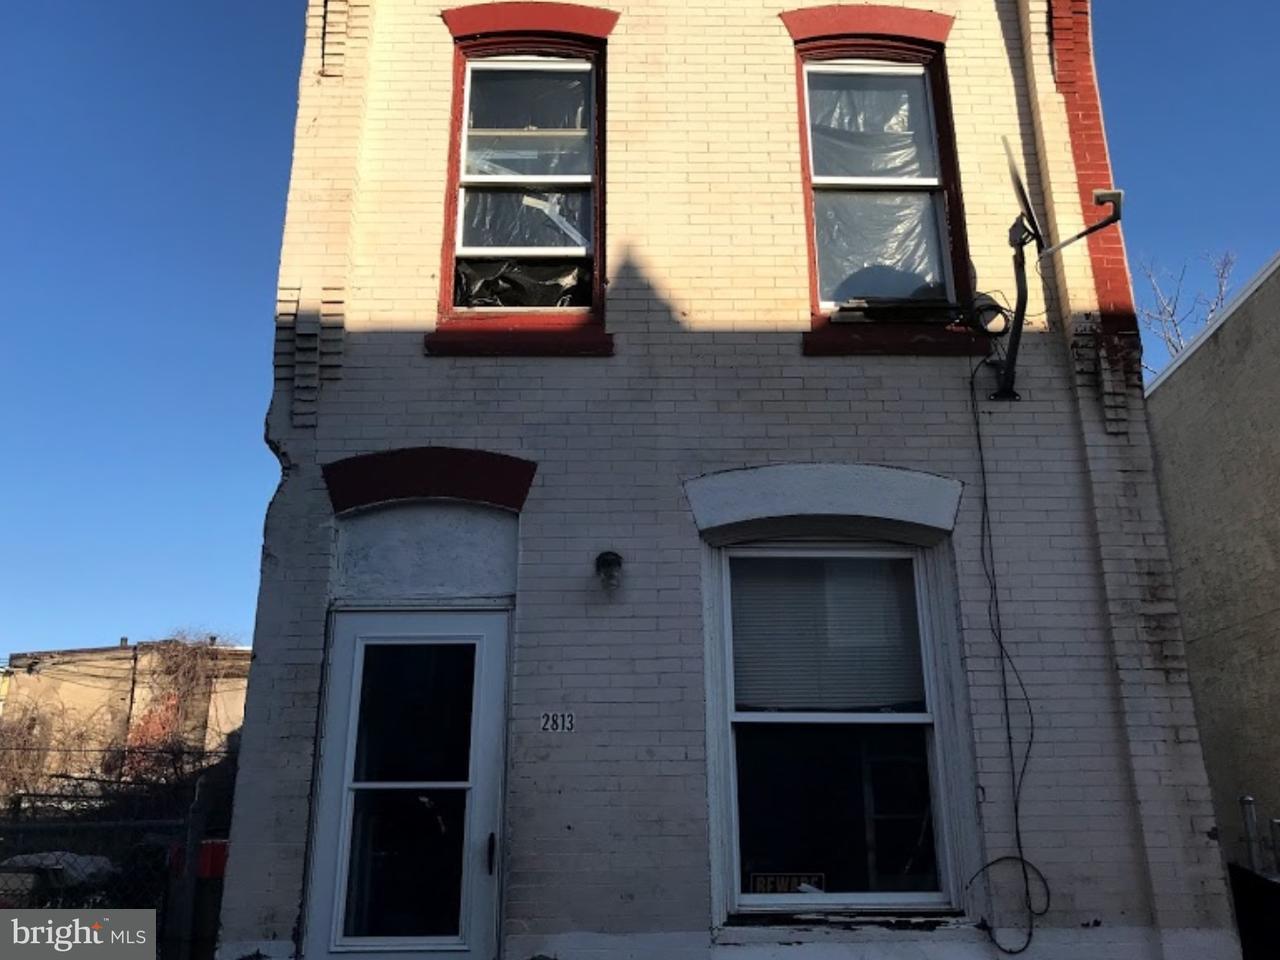 2813 N Lee Philadelphia, PA 19134